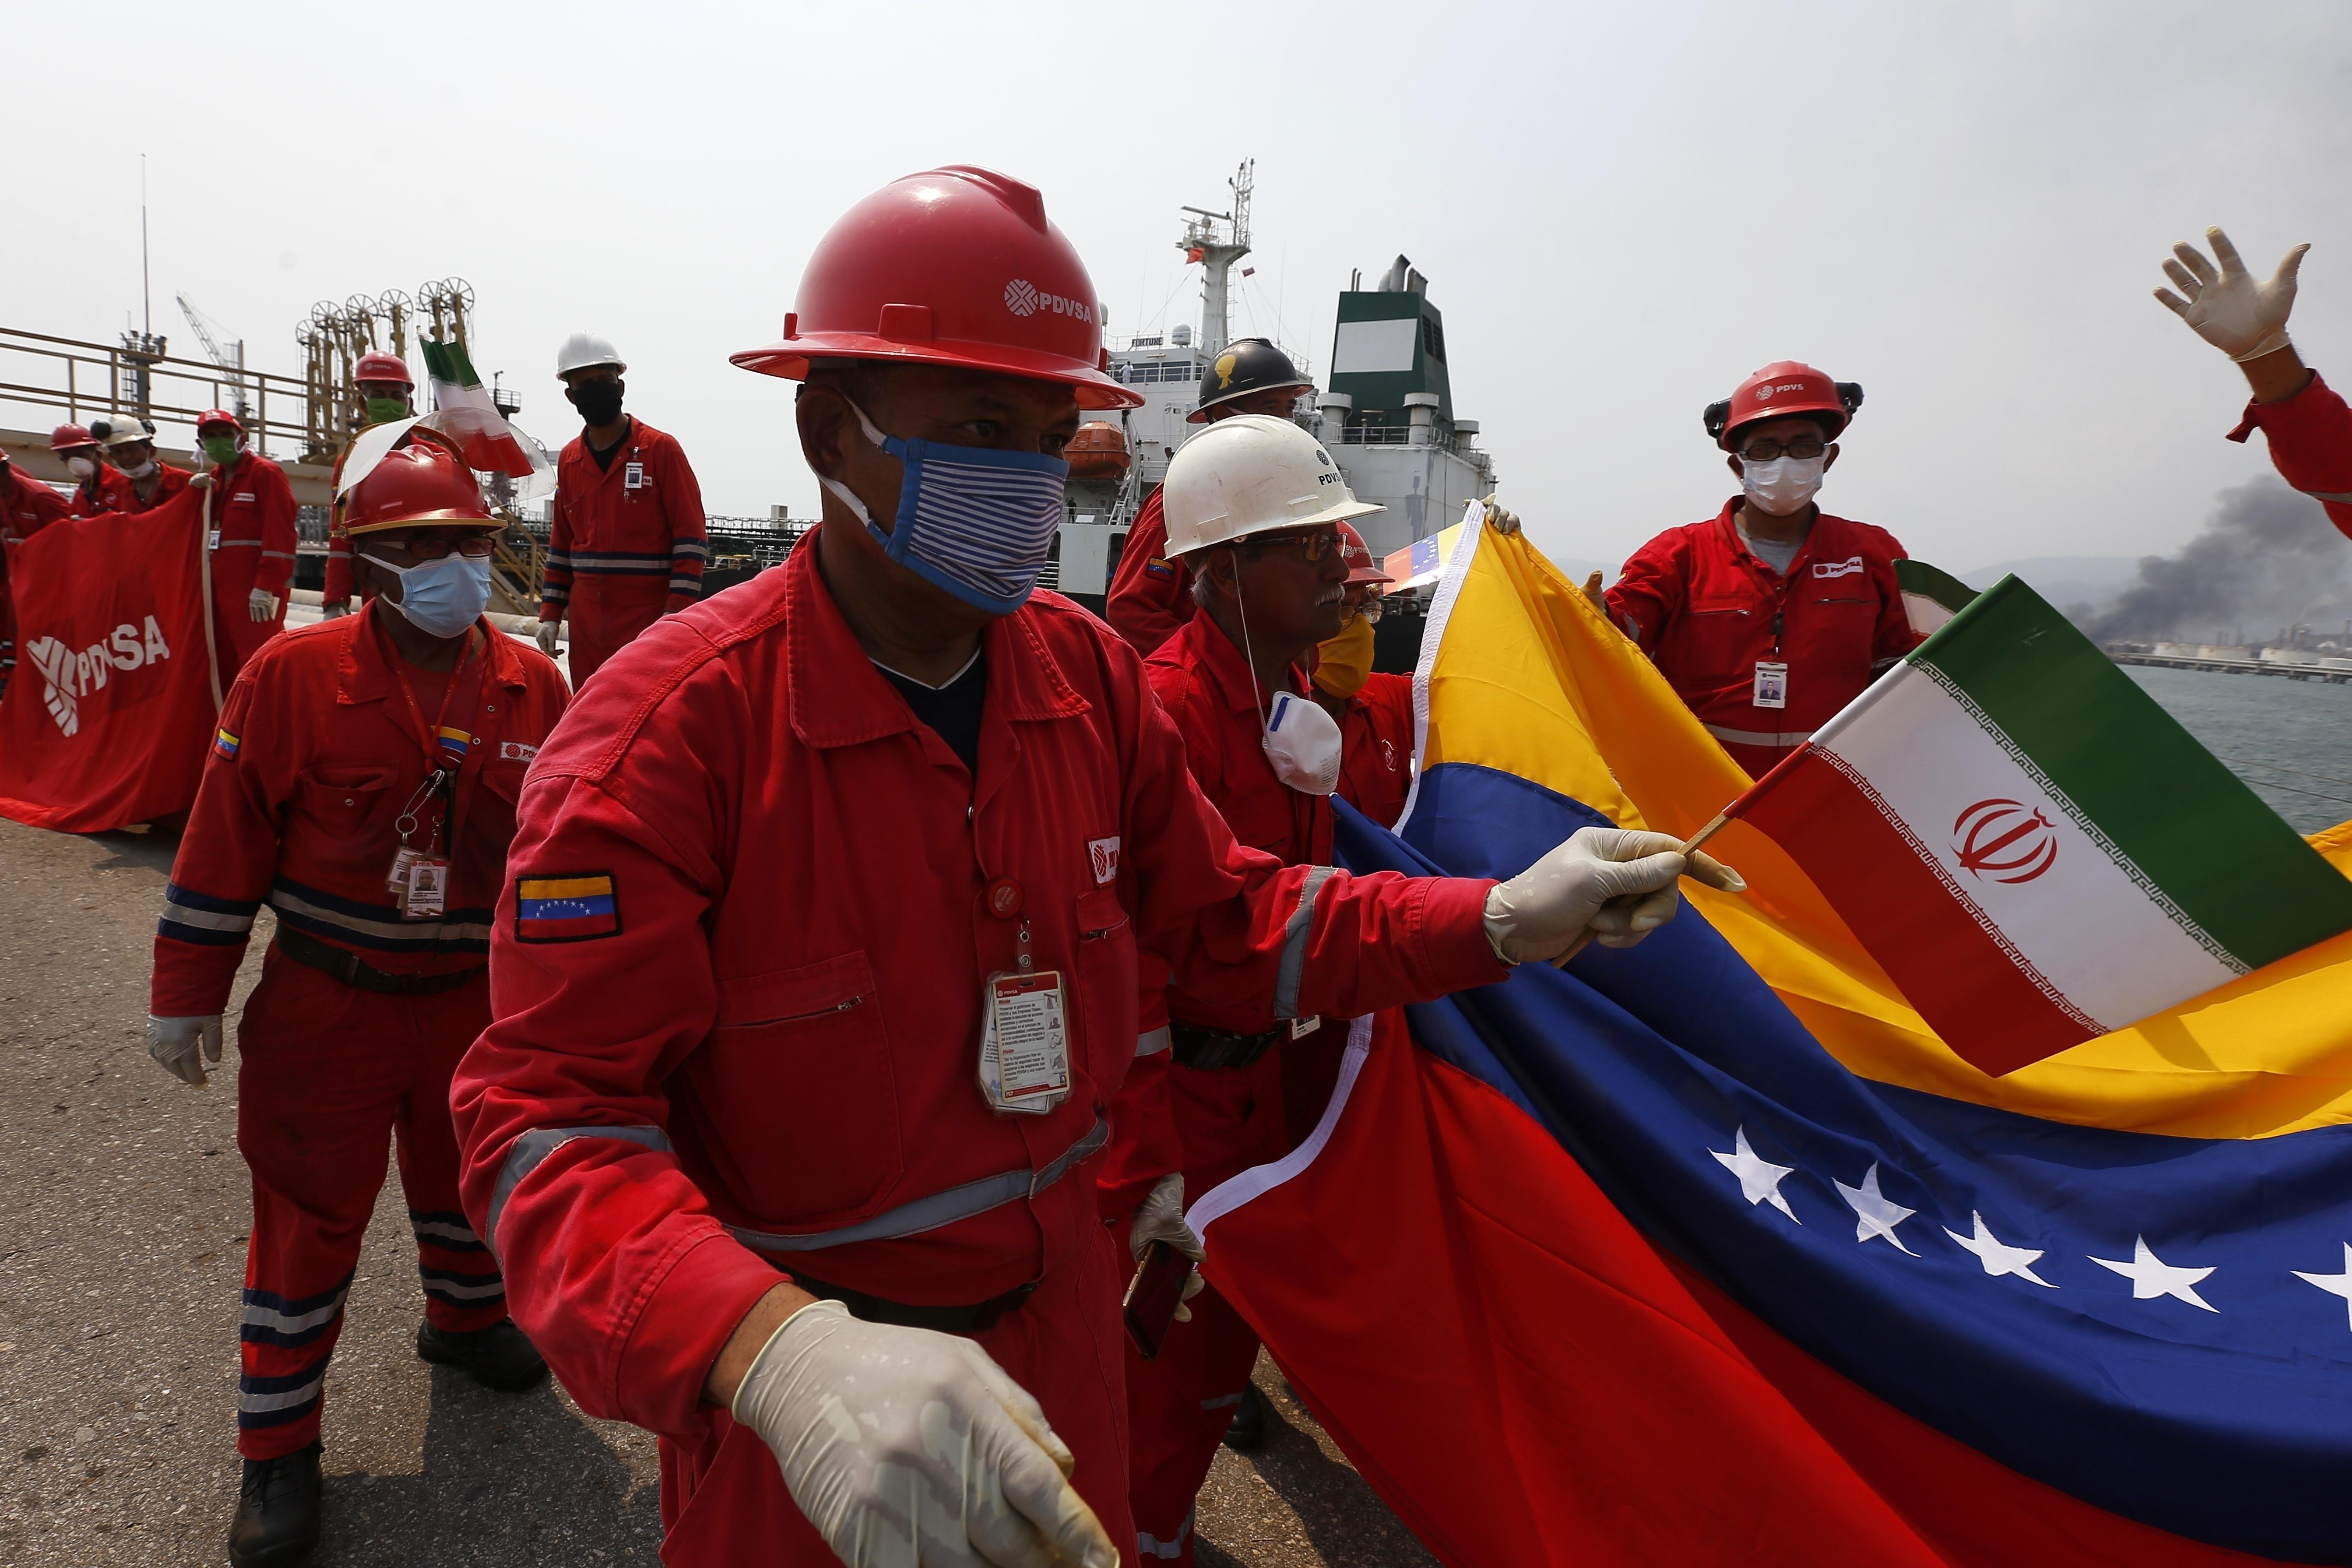 U S Sanctions 5 Iranian Tanker Captains For Gasoline Delivery To Venezuela Washington Times